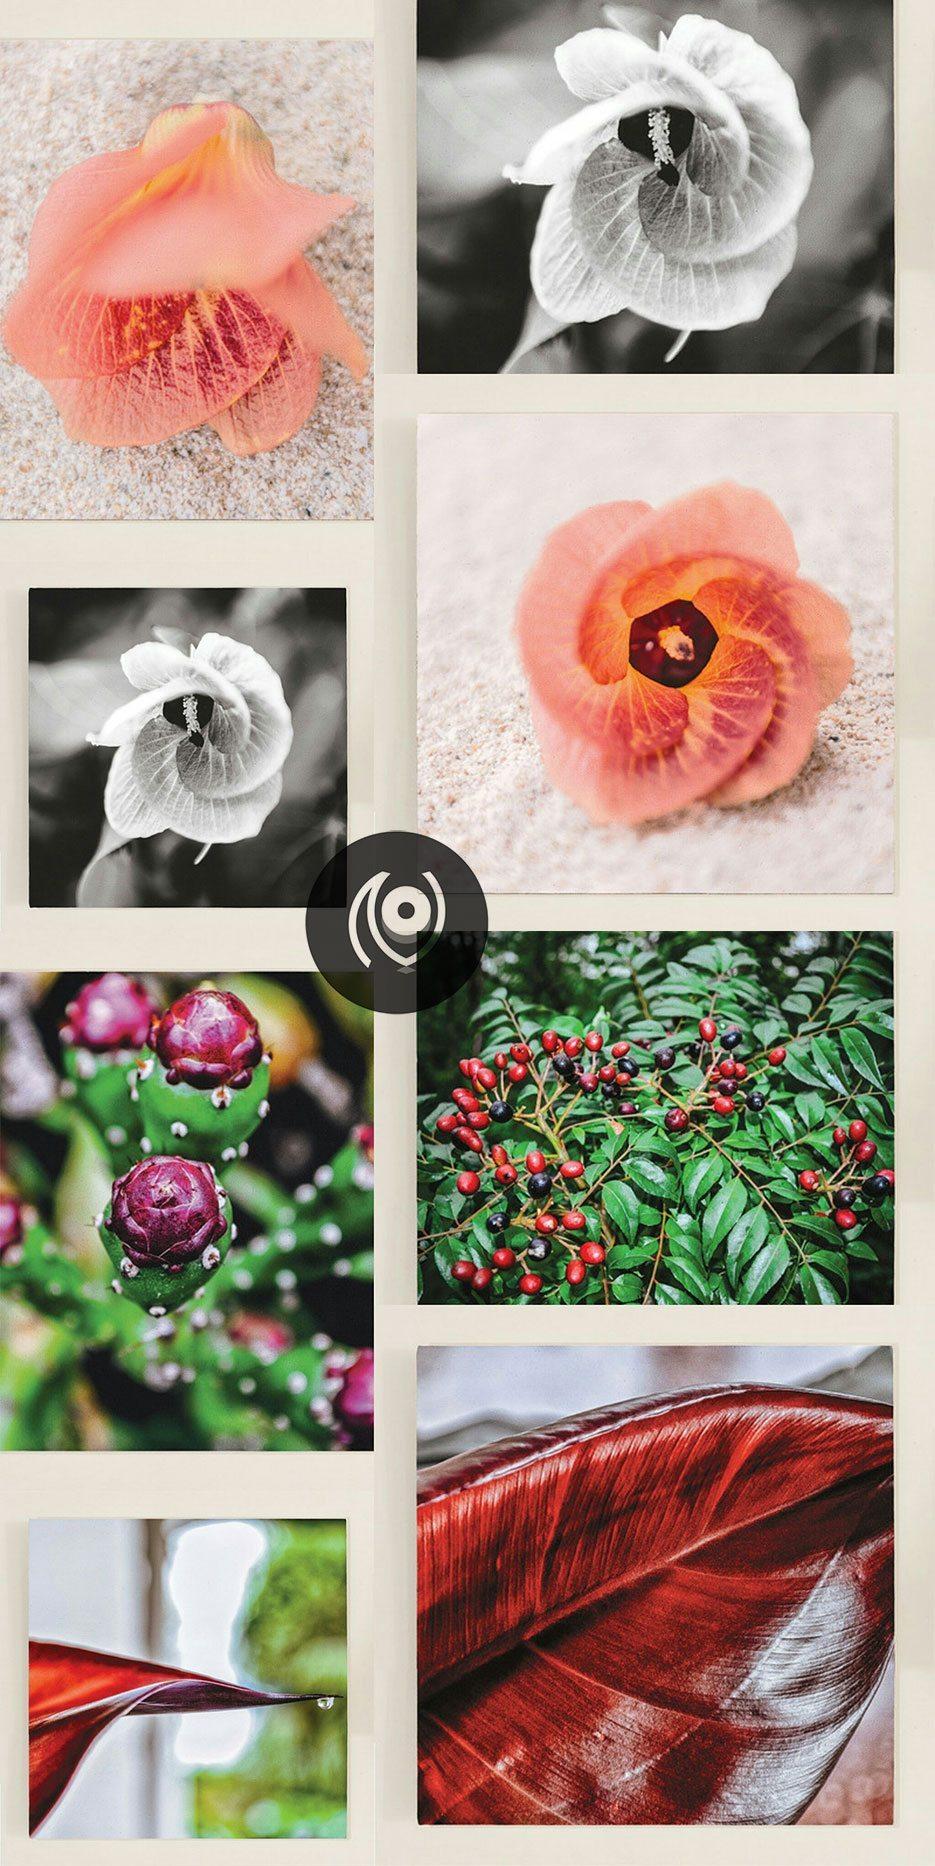 Naina.co-Photographer-Raconteuse-Storyteller-Luxury-Lifestyle-September-2014-WhatsUpNaina-Store-Prints-Framed-Canvas